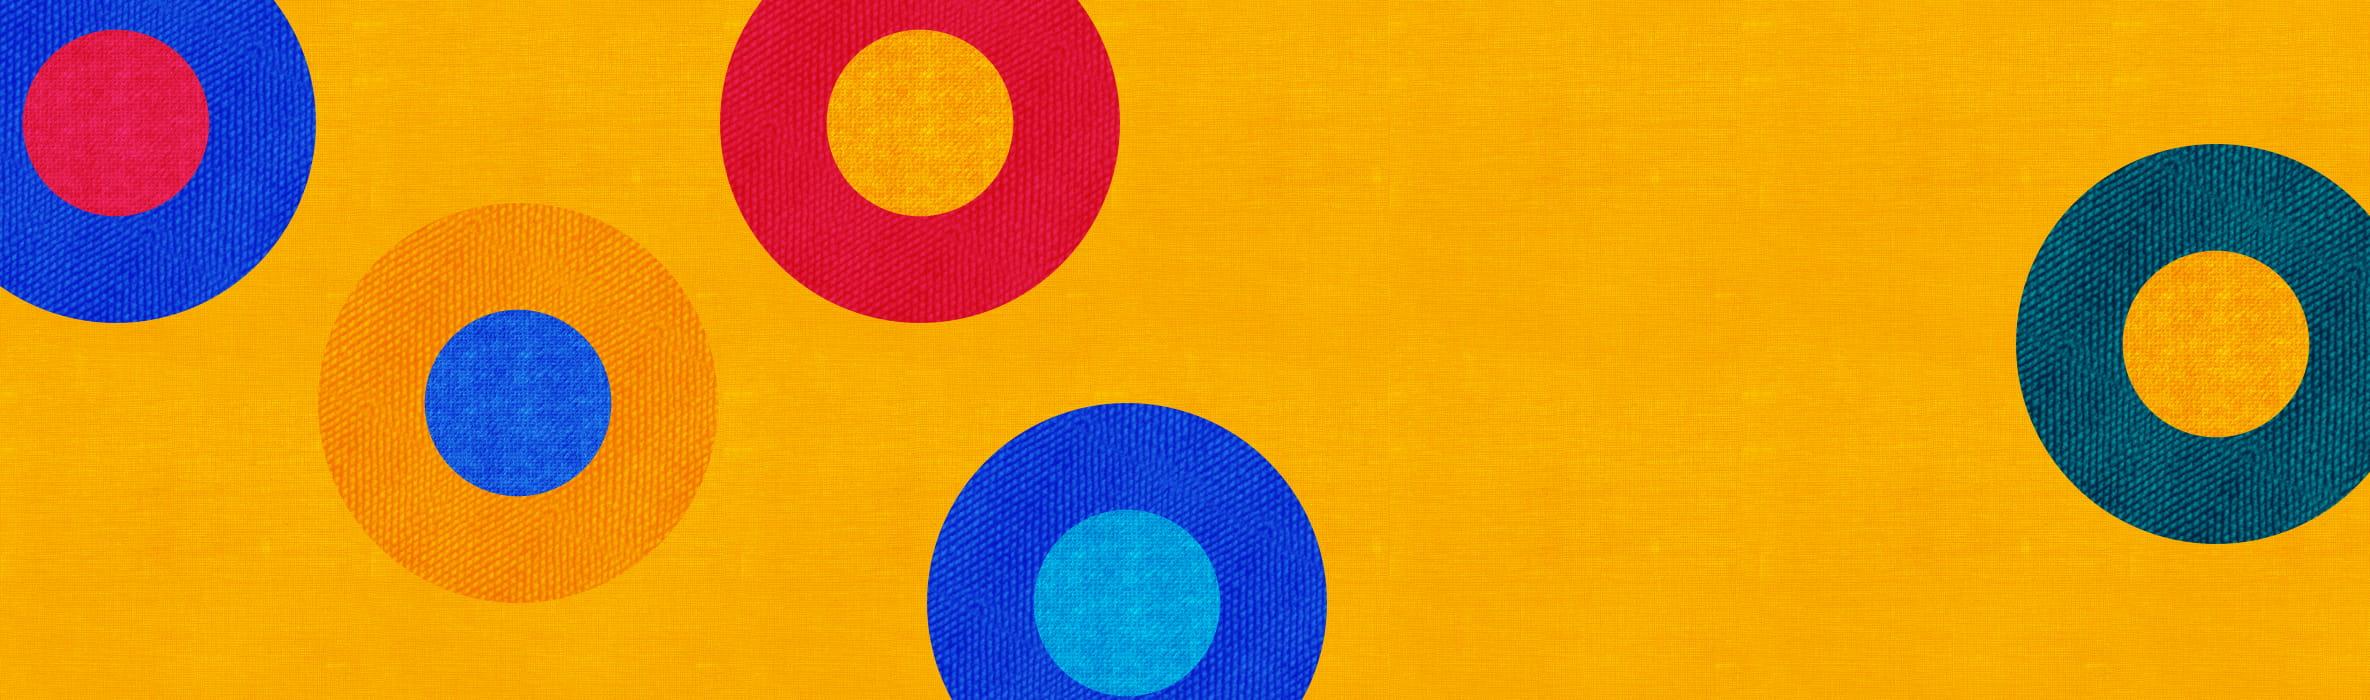 Cerchio multicolore su sfondo arancio